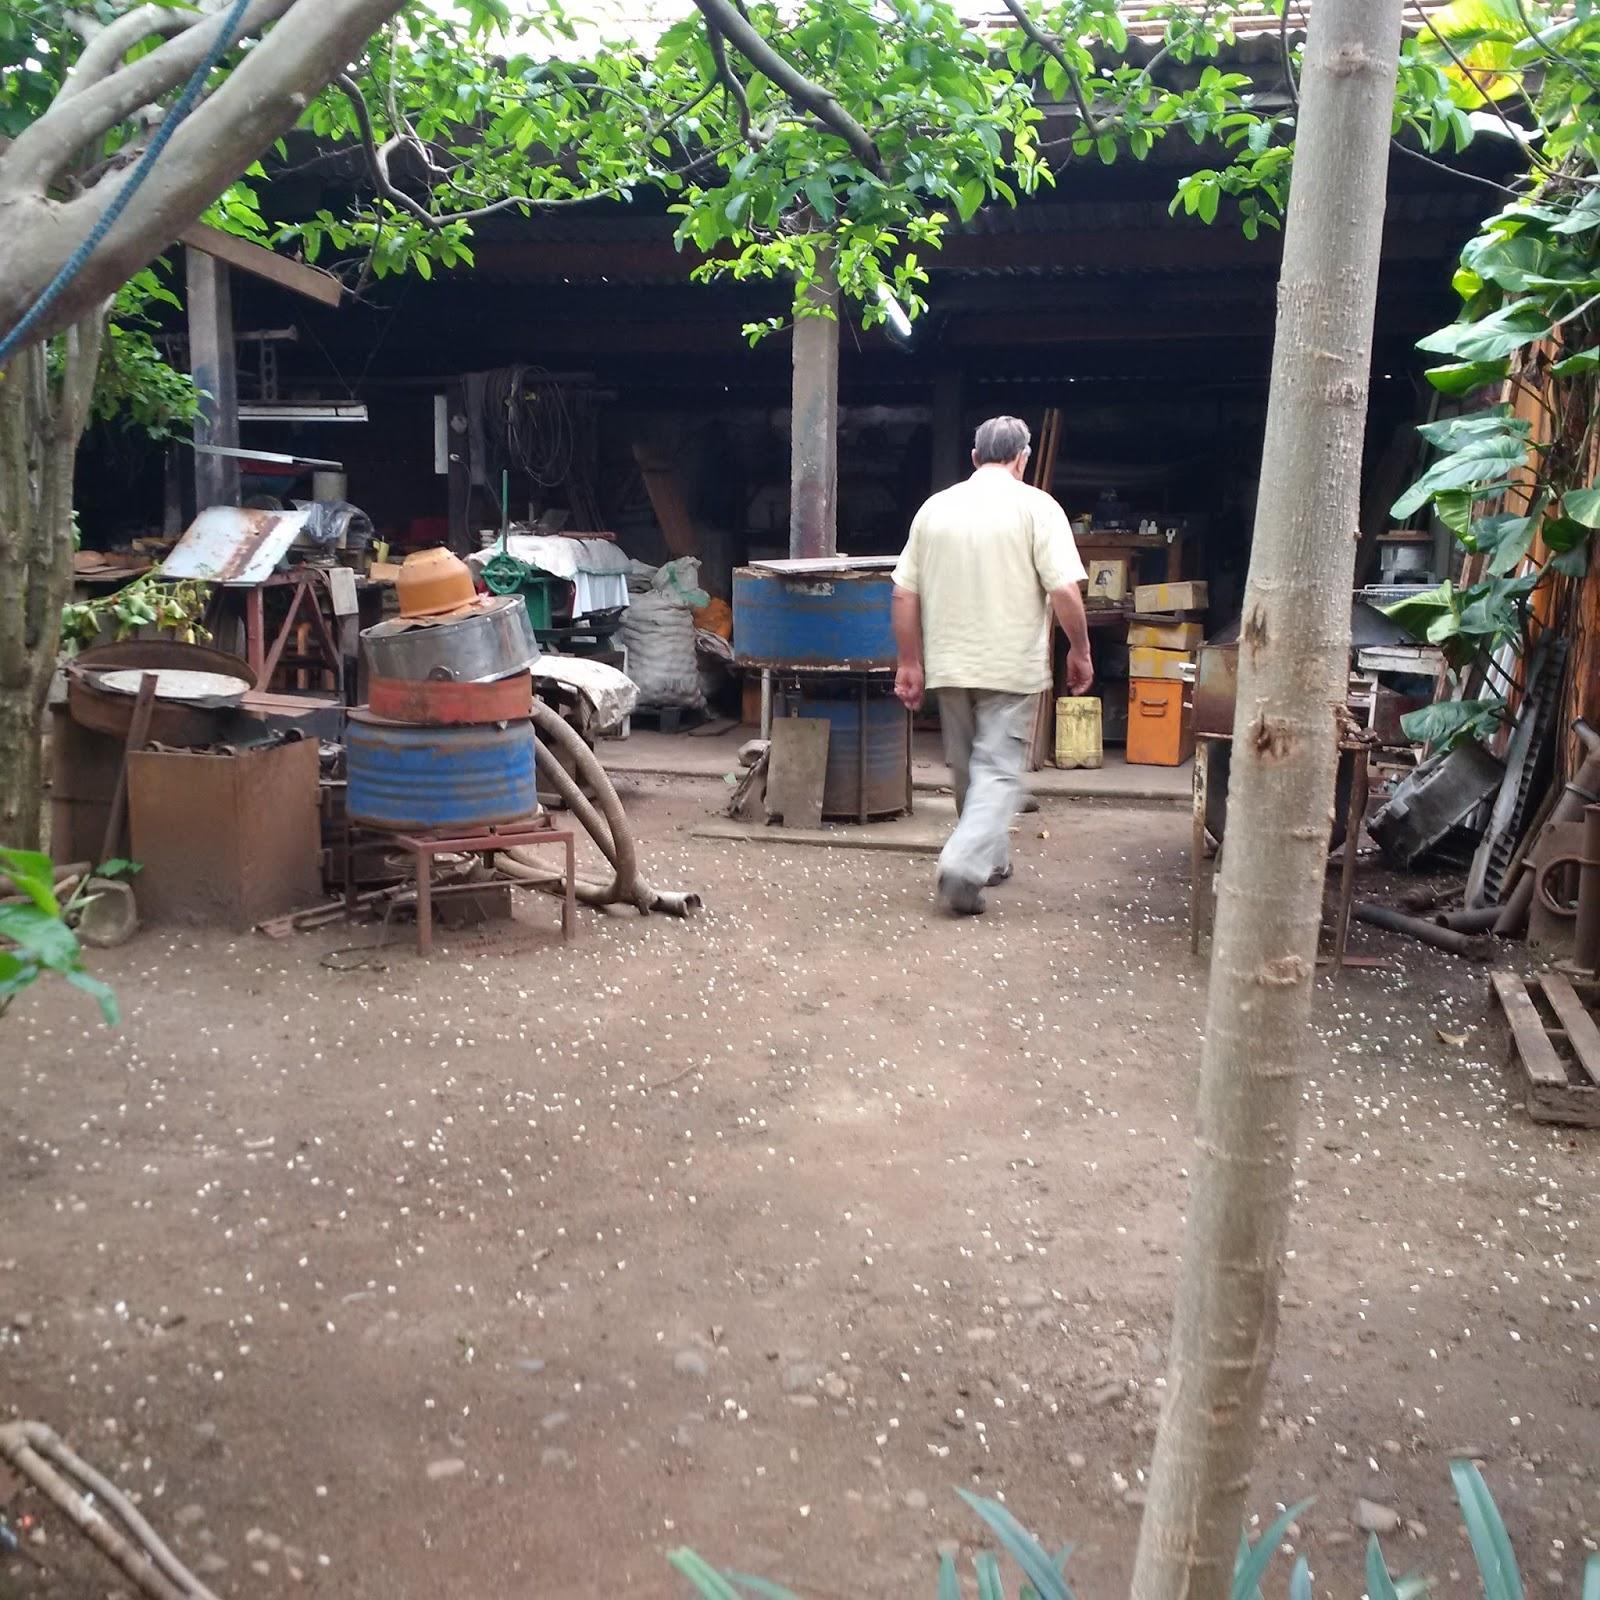 Leptitludeparlemonde un jardin extraordinaire for Jardin extraordinaire nancy 2015